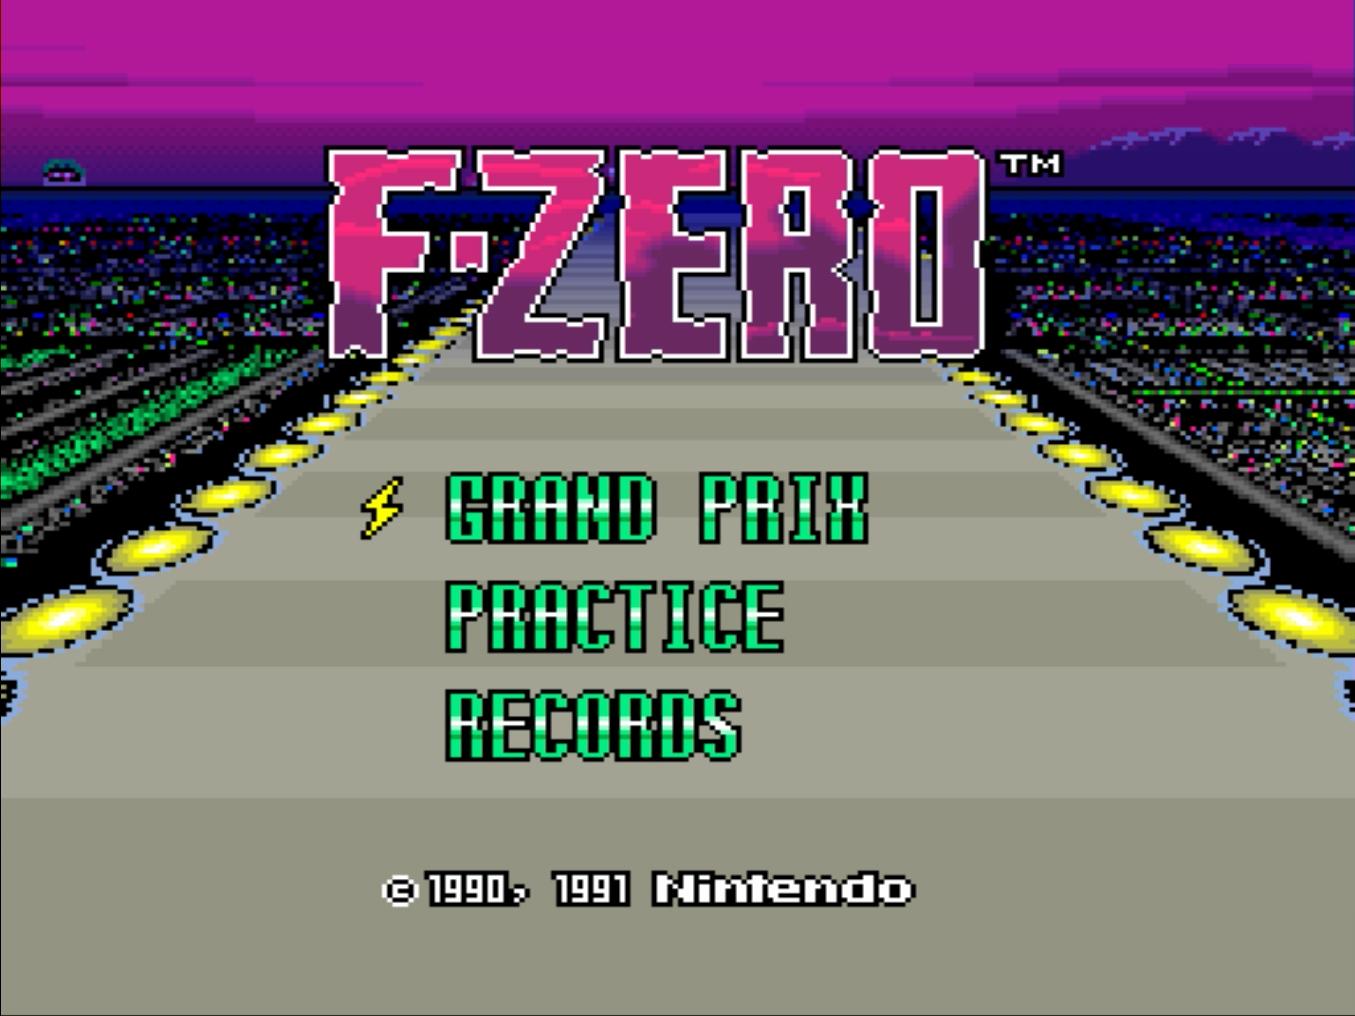 F-Zero Screenshot (Graphic: Business Wire)